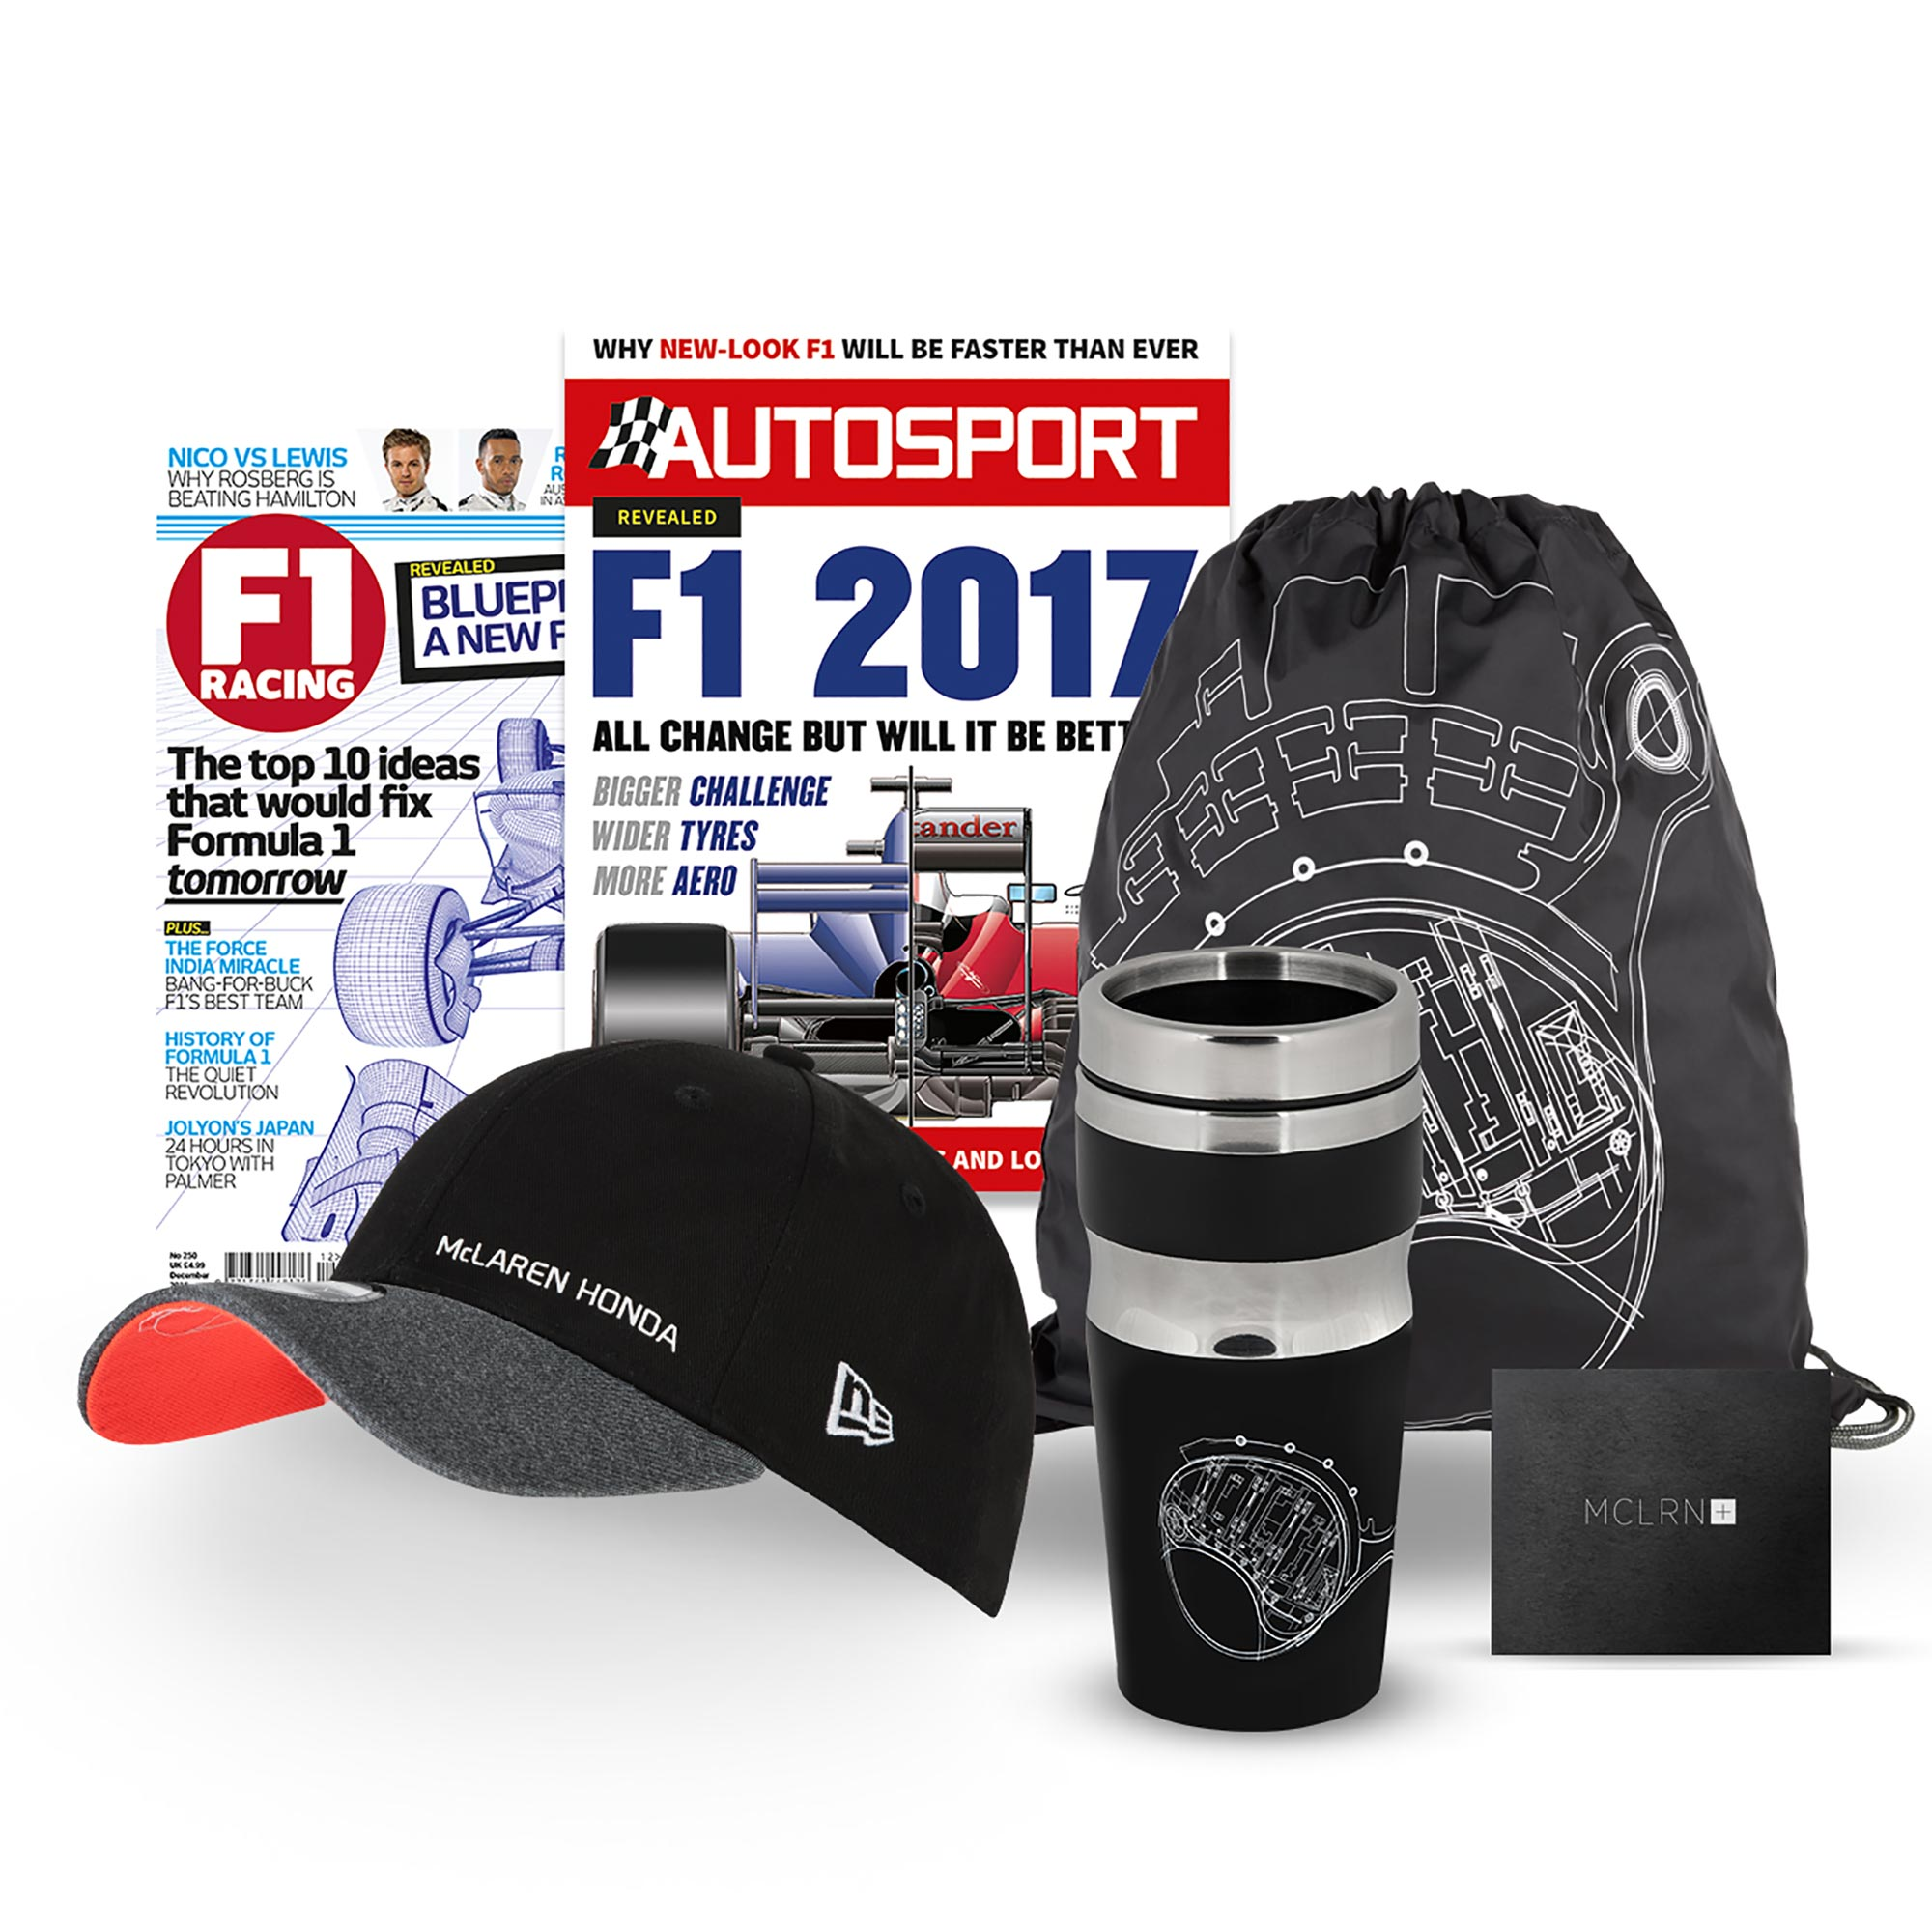 McLaren+ Standard Supporter Pack